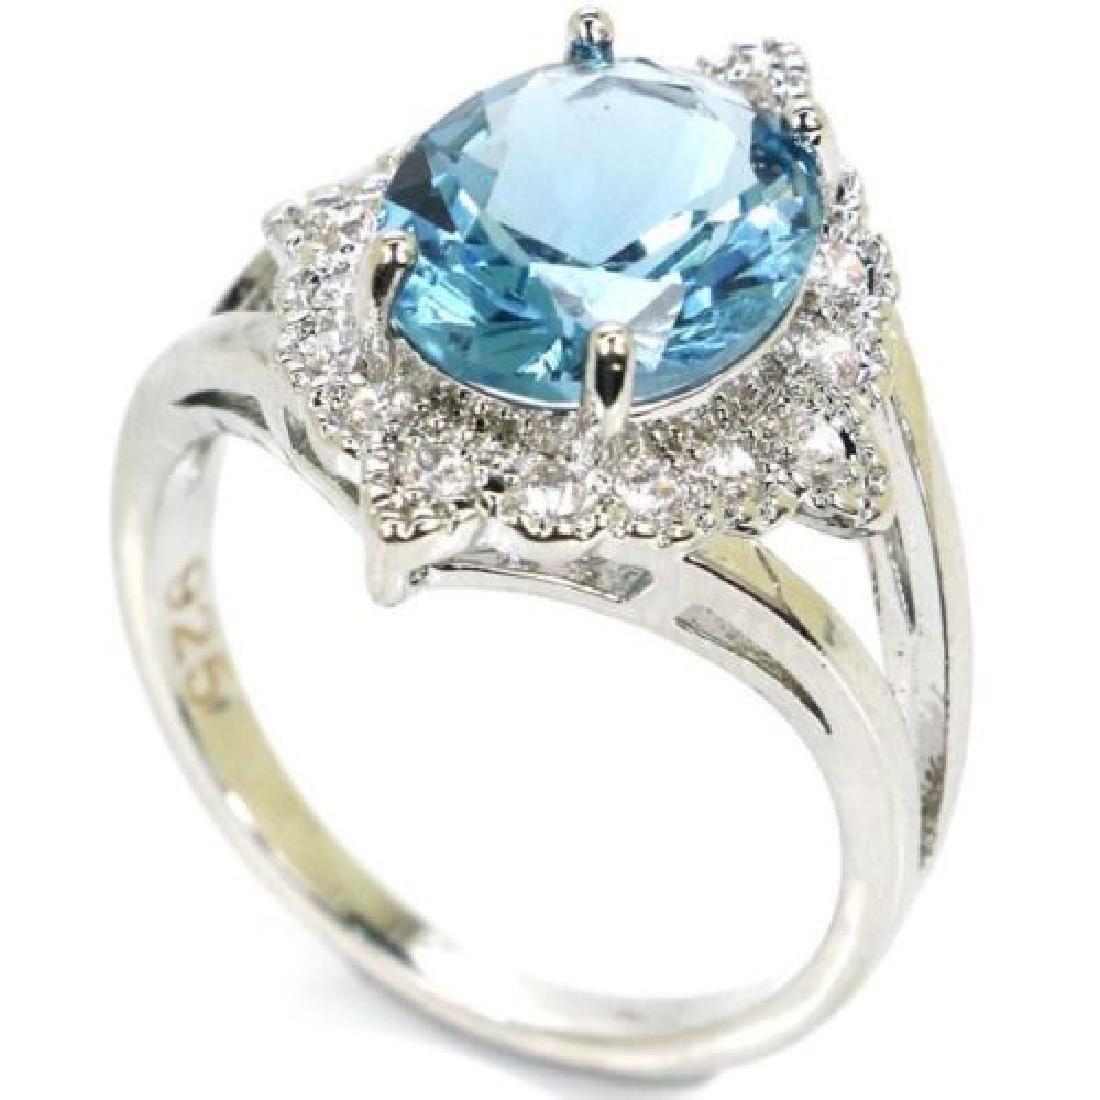 Luxury London Blue Topaz Silver Ring Us sz9.25 - 2